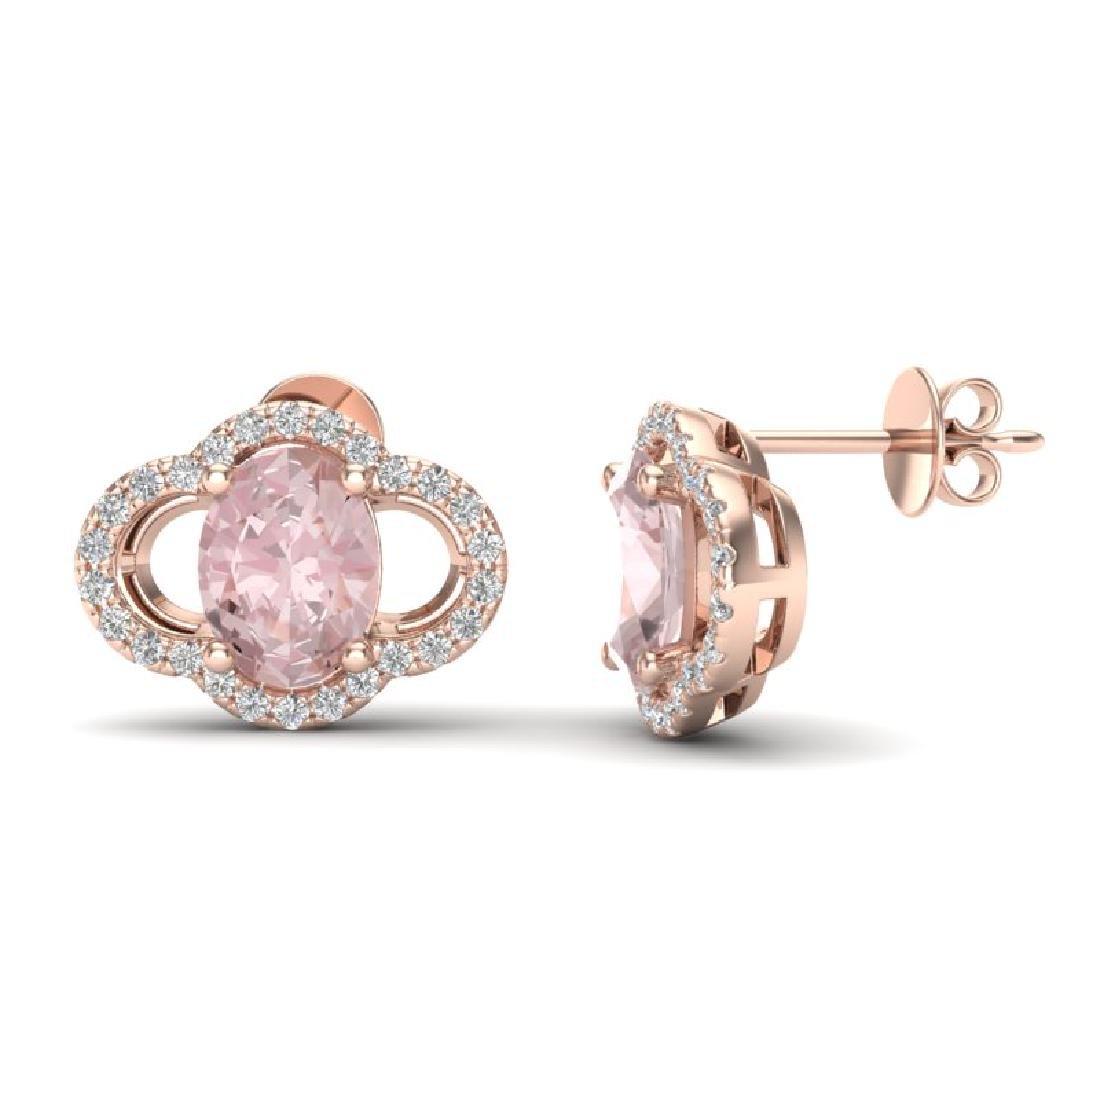 3.50 CTW Morganie & Micro Pave VS/SI Diamond Earrings